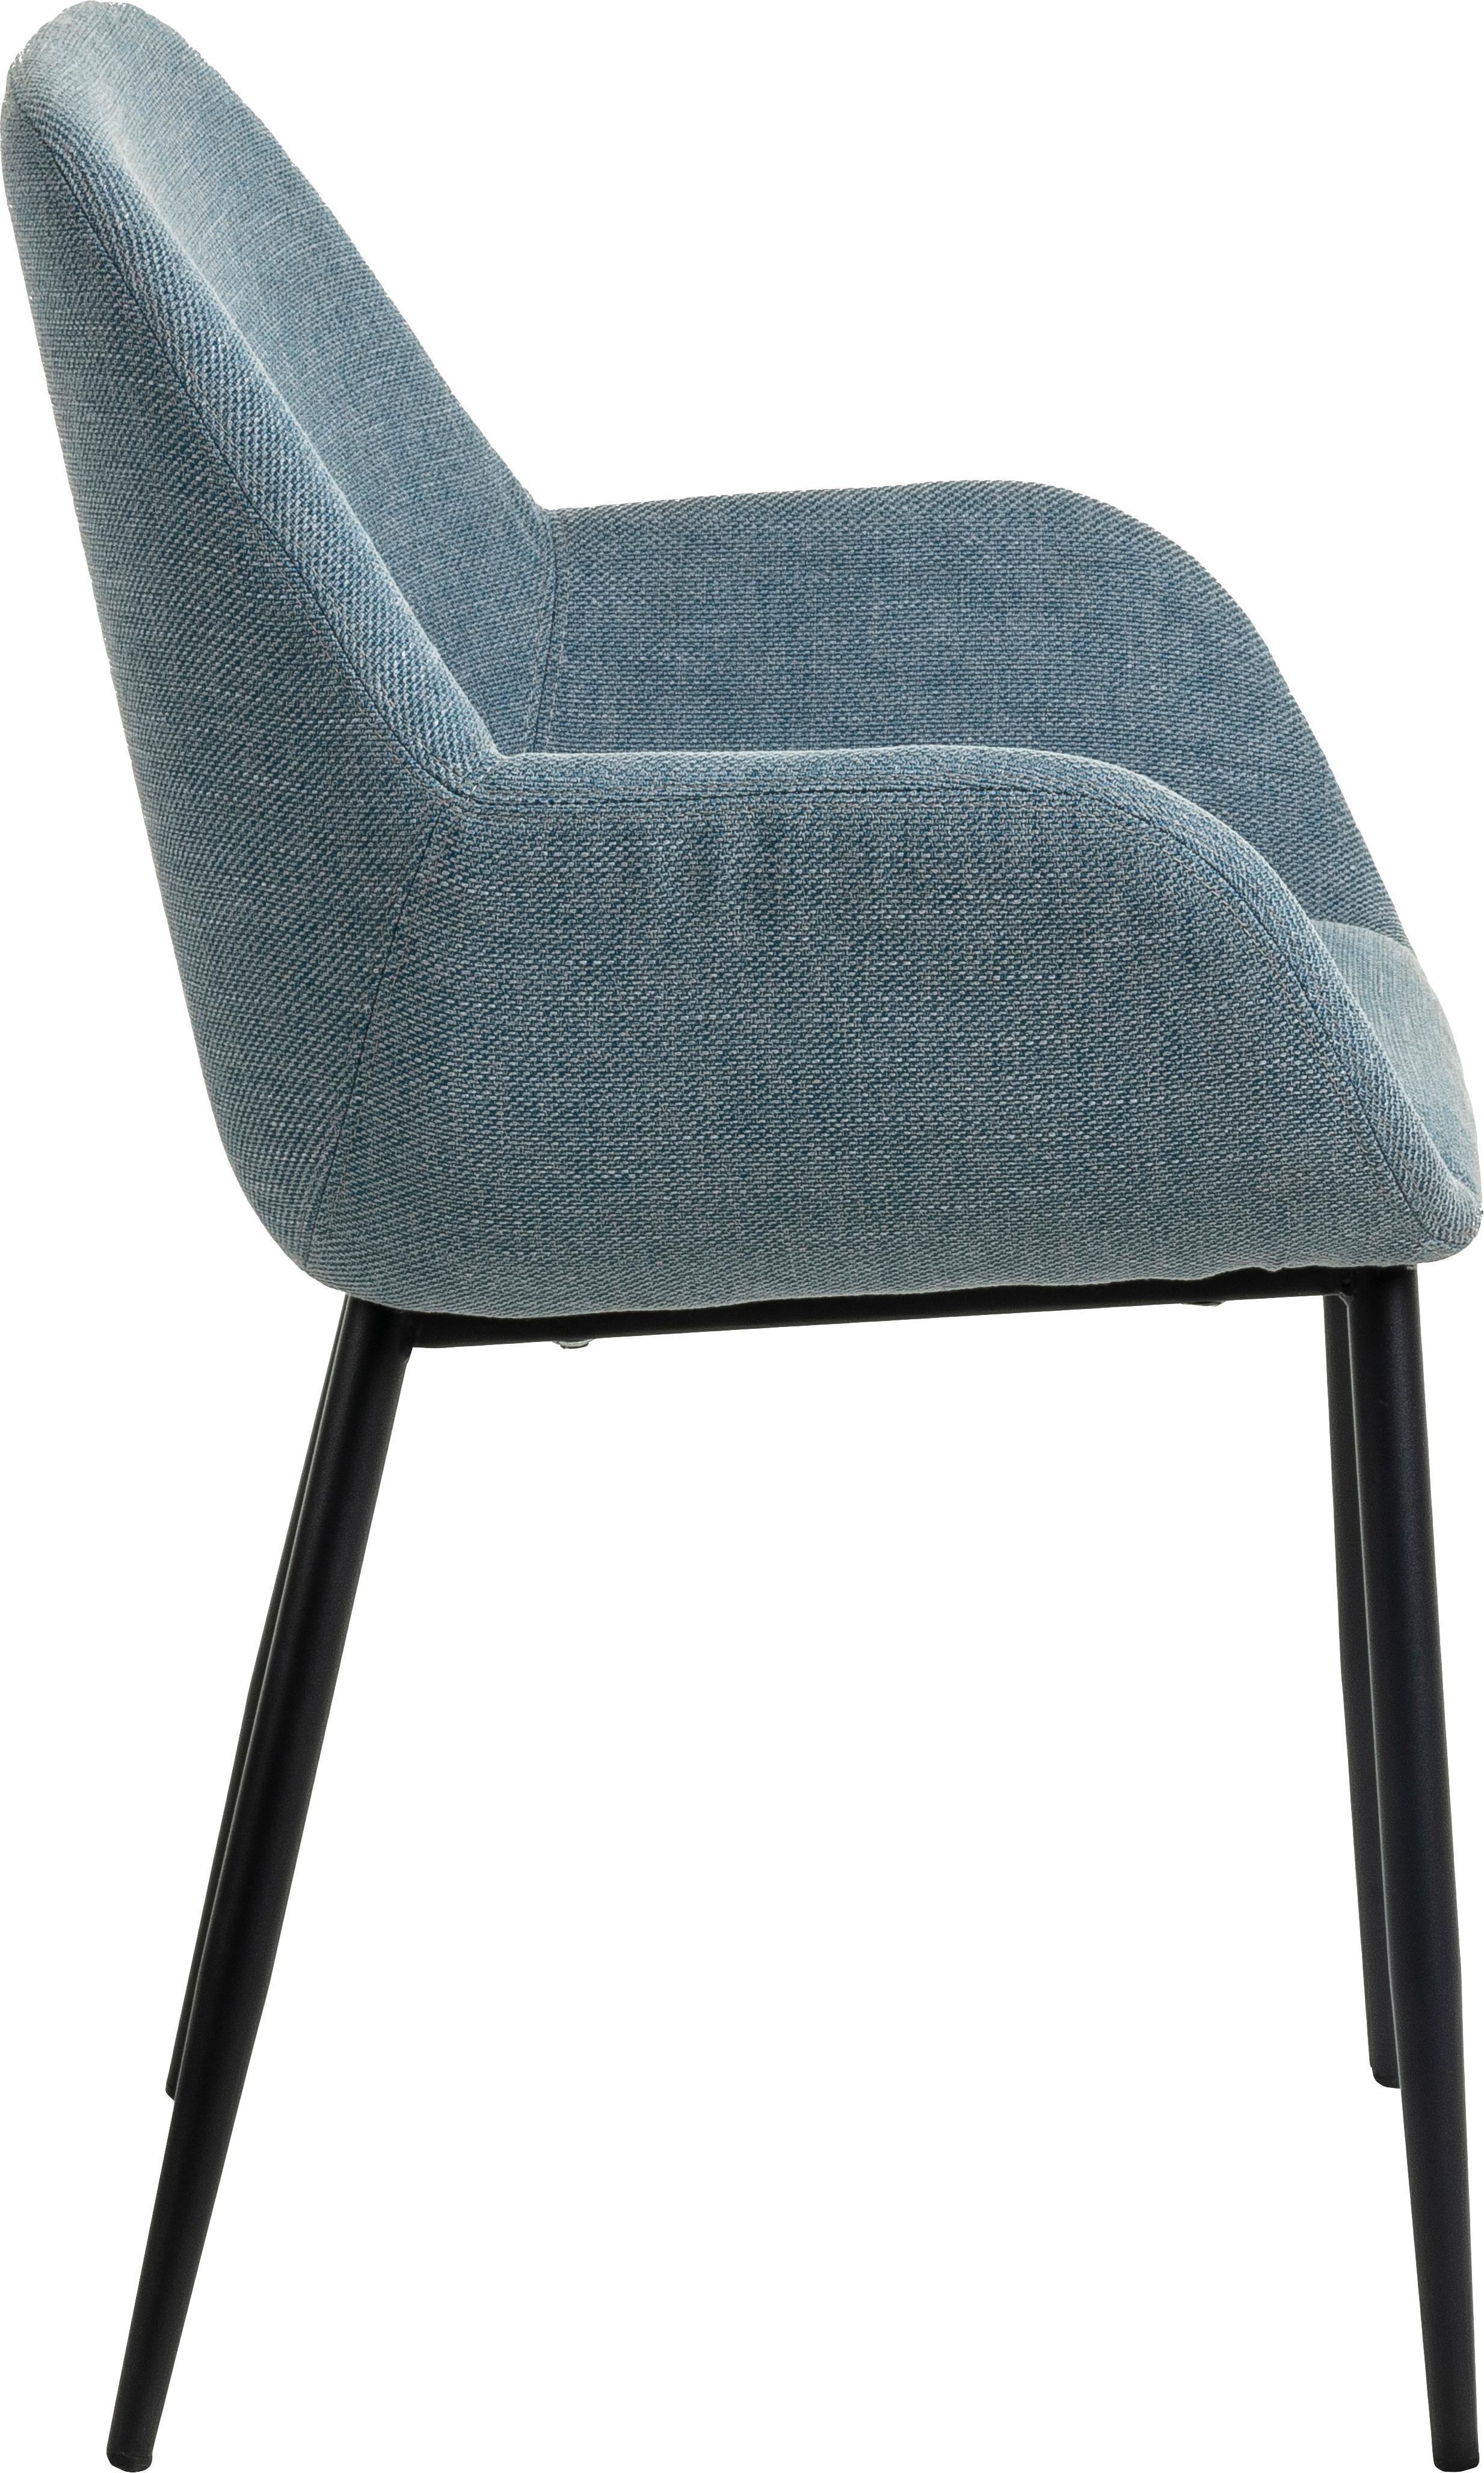 Armlehnstühle Kona, 2 Stück, Bezug: Polyester 50.000 Scheuert, Beine: Metall, lackiert, Webstoff Blau, B 59 x T 56 cm